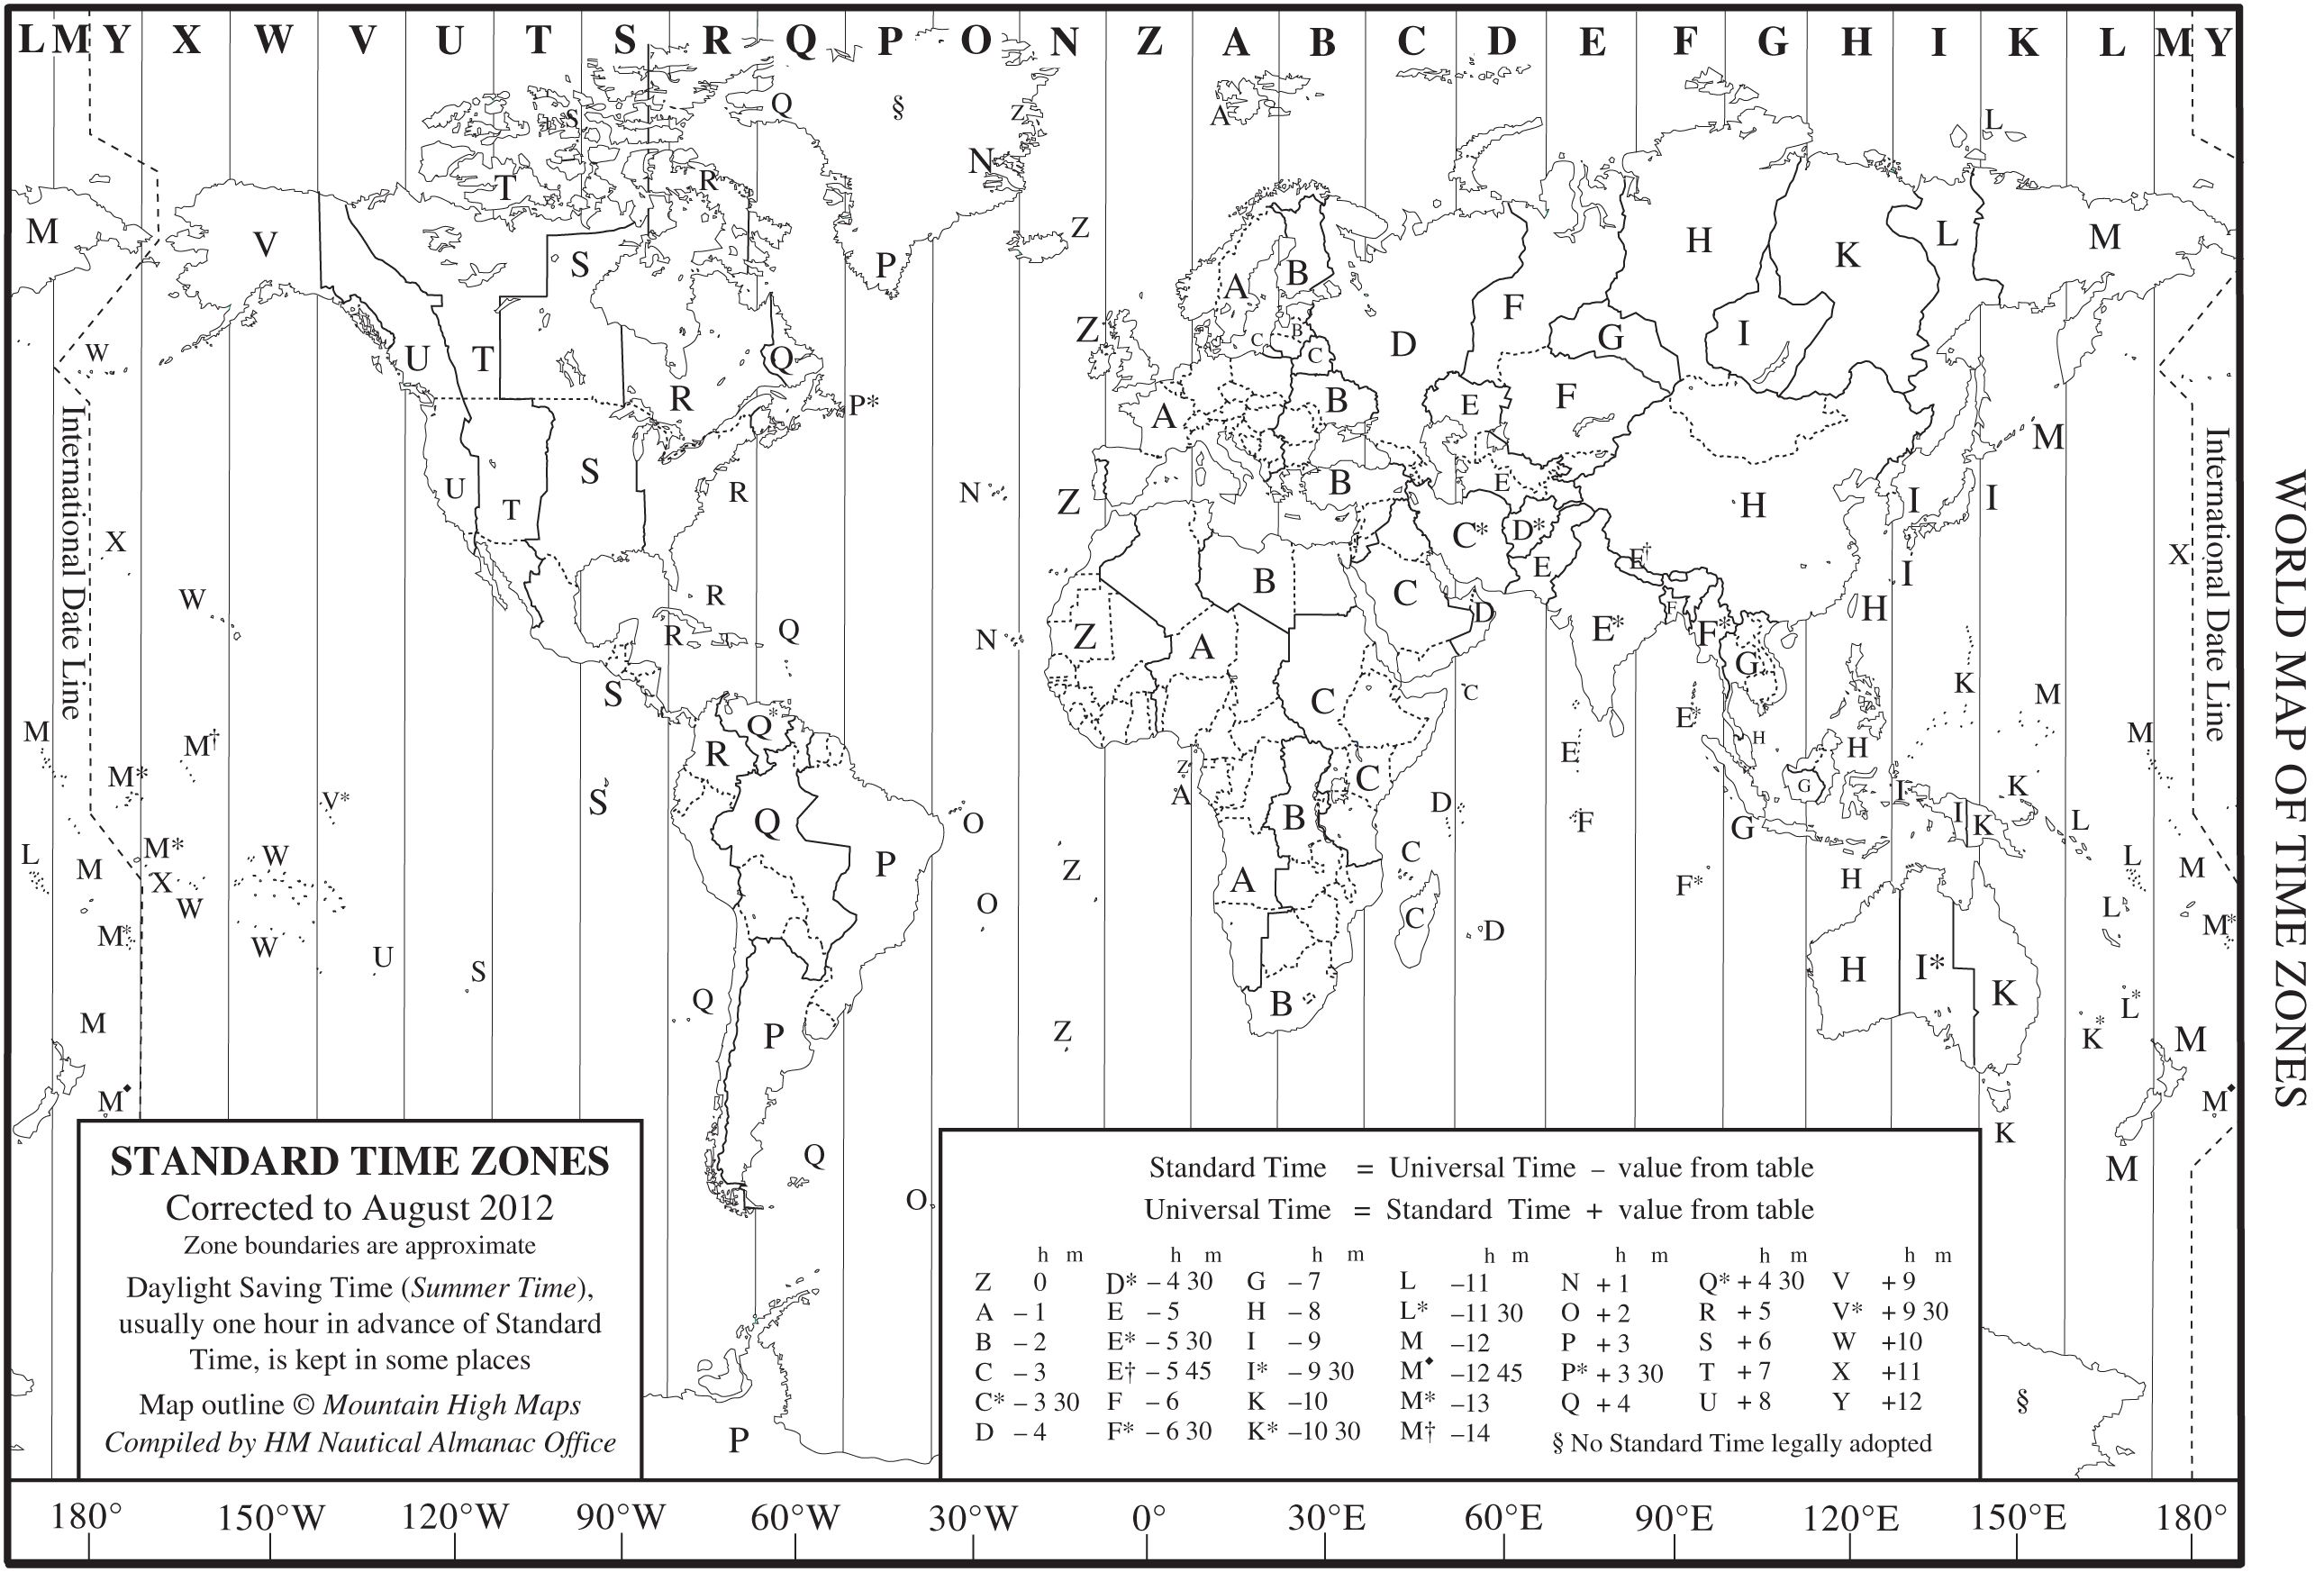 medium resolution of http://aa.usno.navy.mil/graphics/TimeZoneMap0812.jpg   World time zones